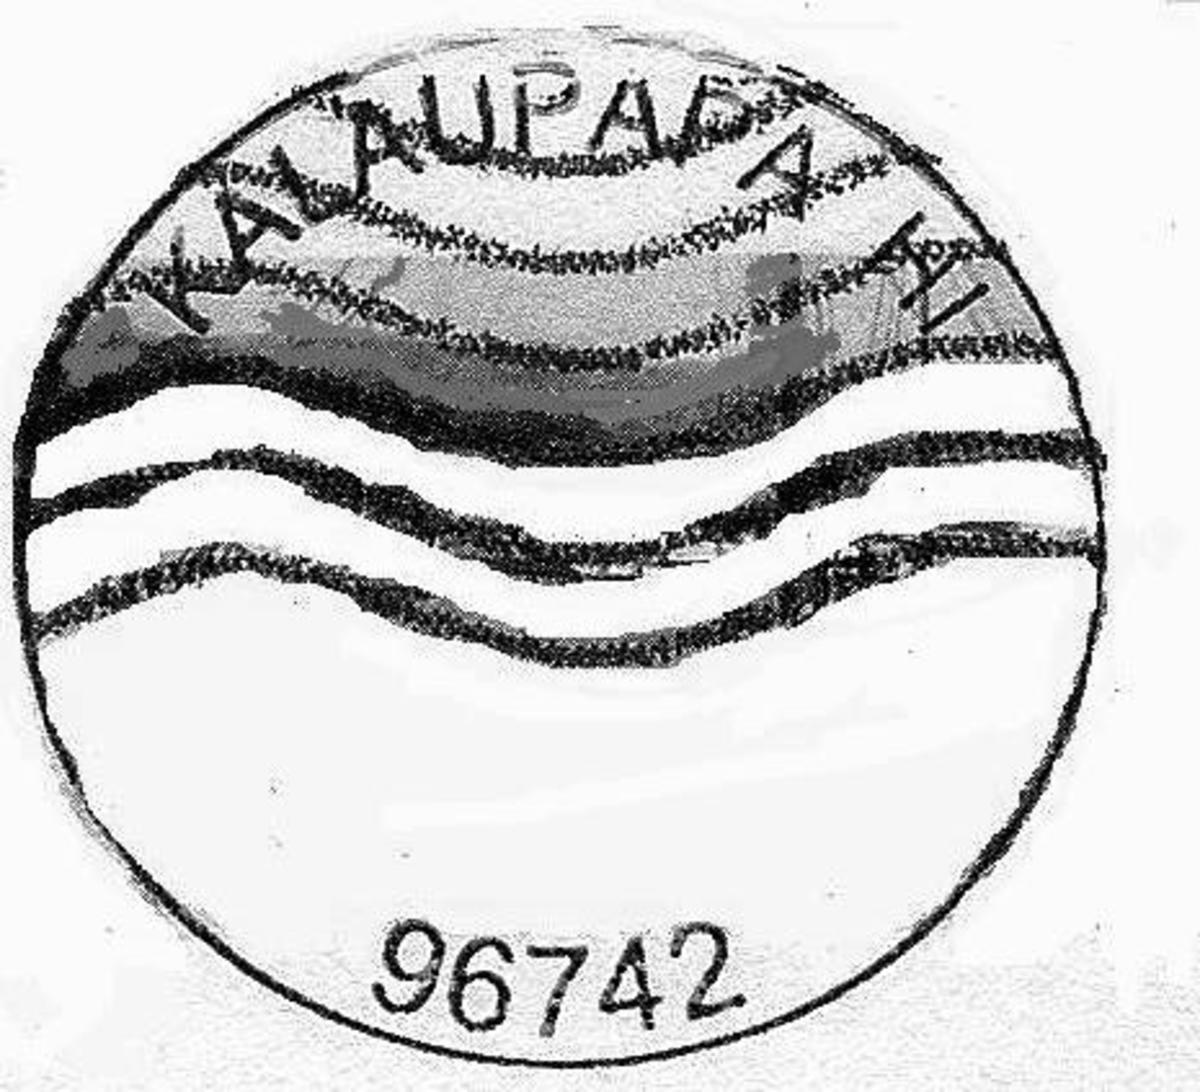 Kalaupapa, Molokaʻi: Story of Exile